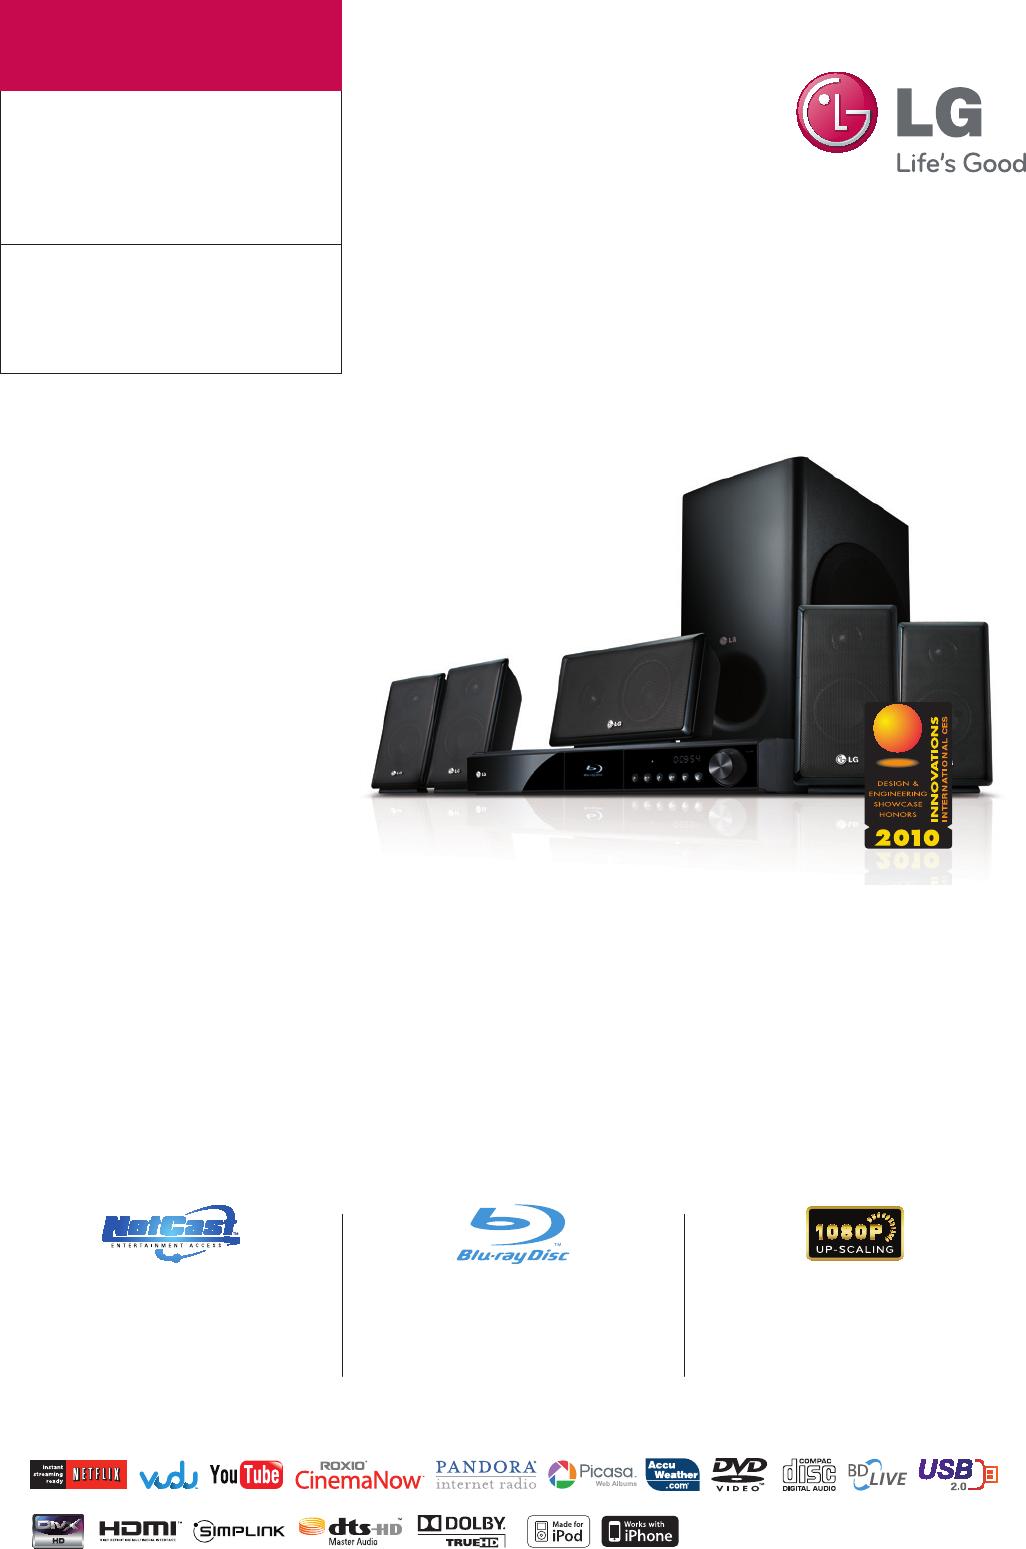 lg lhb335 user manual specification he dm ss rh usermanual wiki LG Surround Sound LG Surround Sound